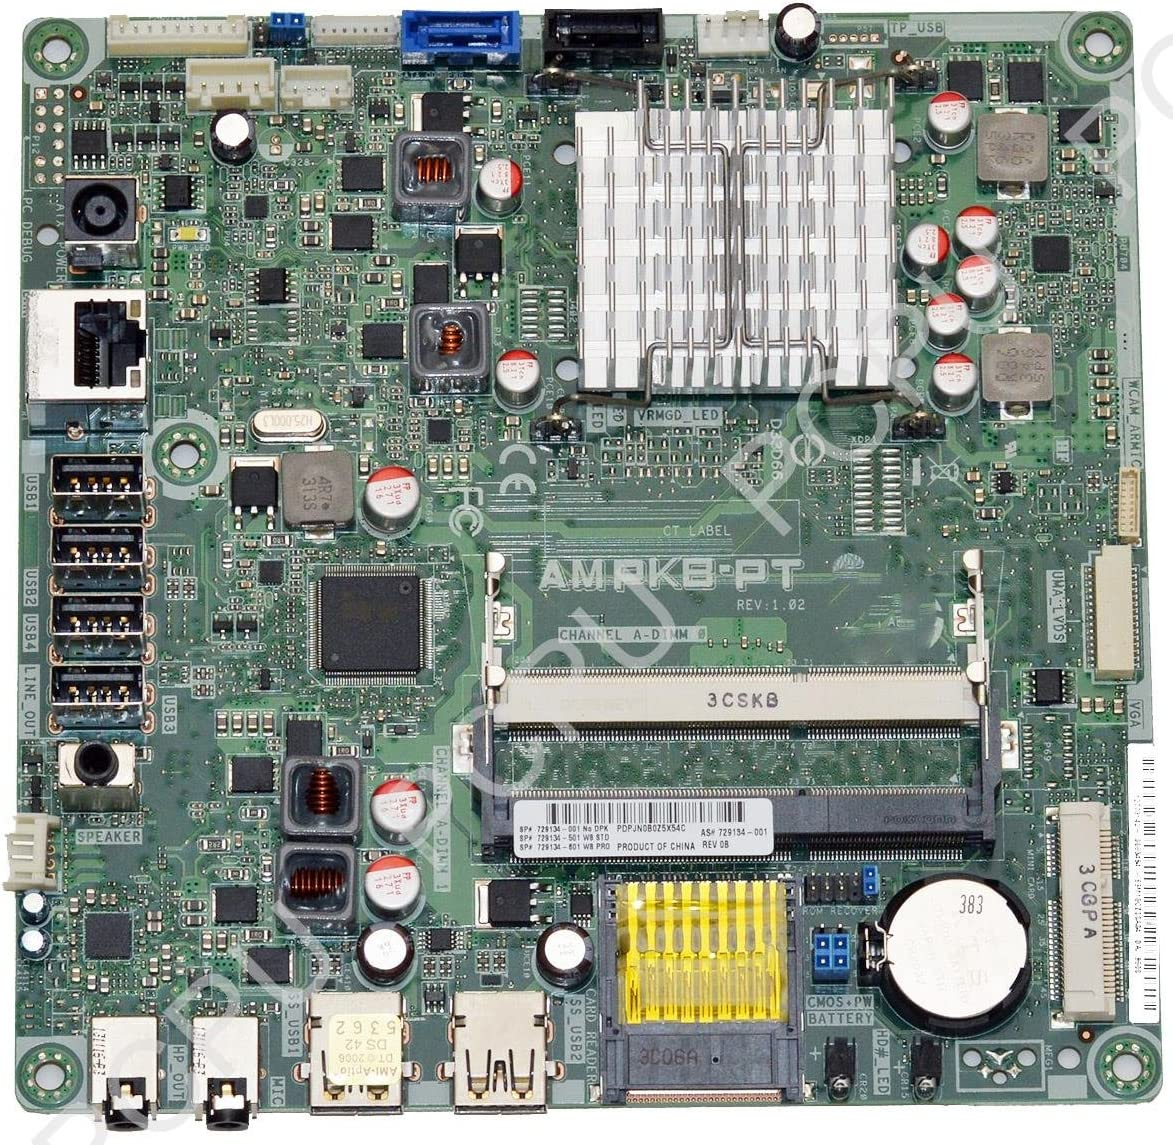 HP TS 19 Daisy Kabini AIO Motherboard AMD E1-2500 1.4GHz CPU 729134-001